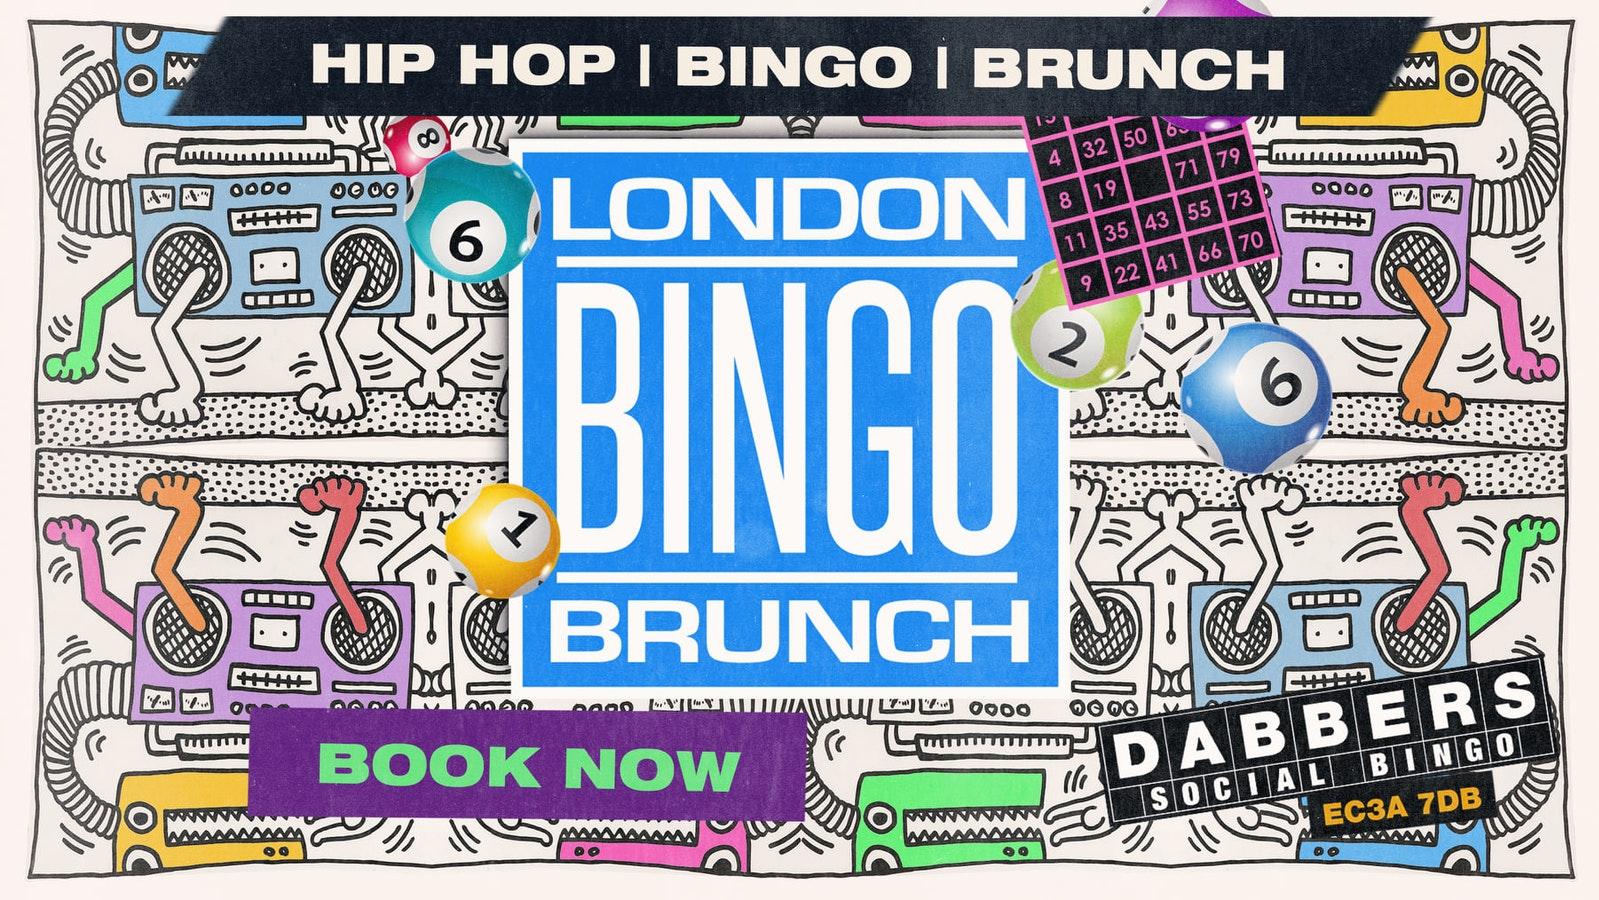 London Bingo Brunch: The Official Post-Lockdown Hip Hop Launch Party!